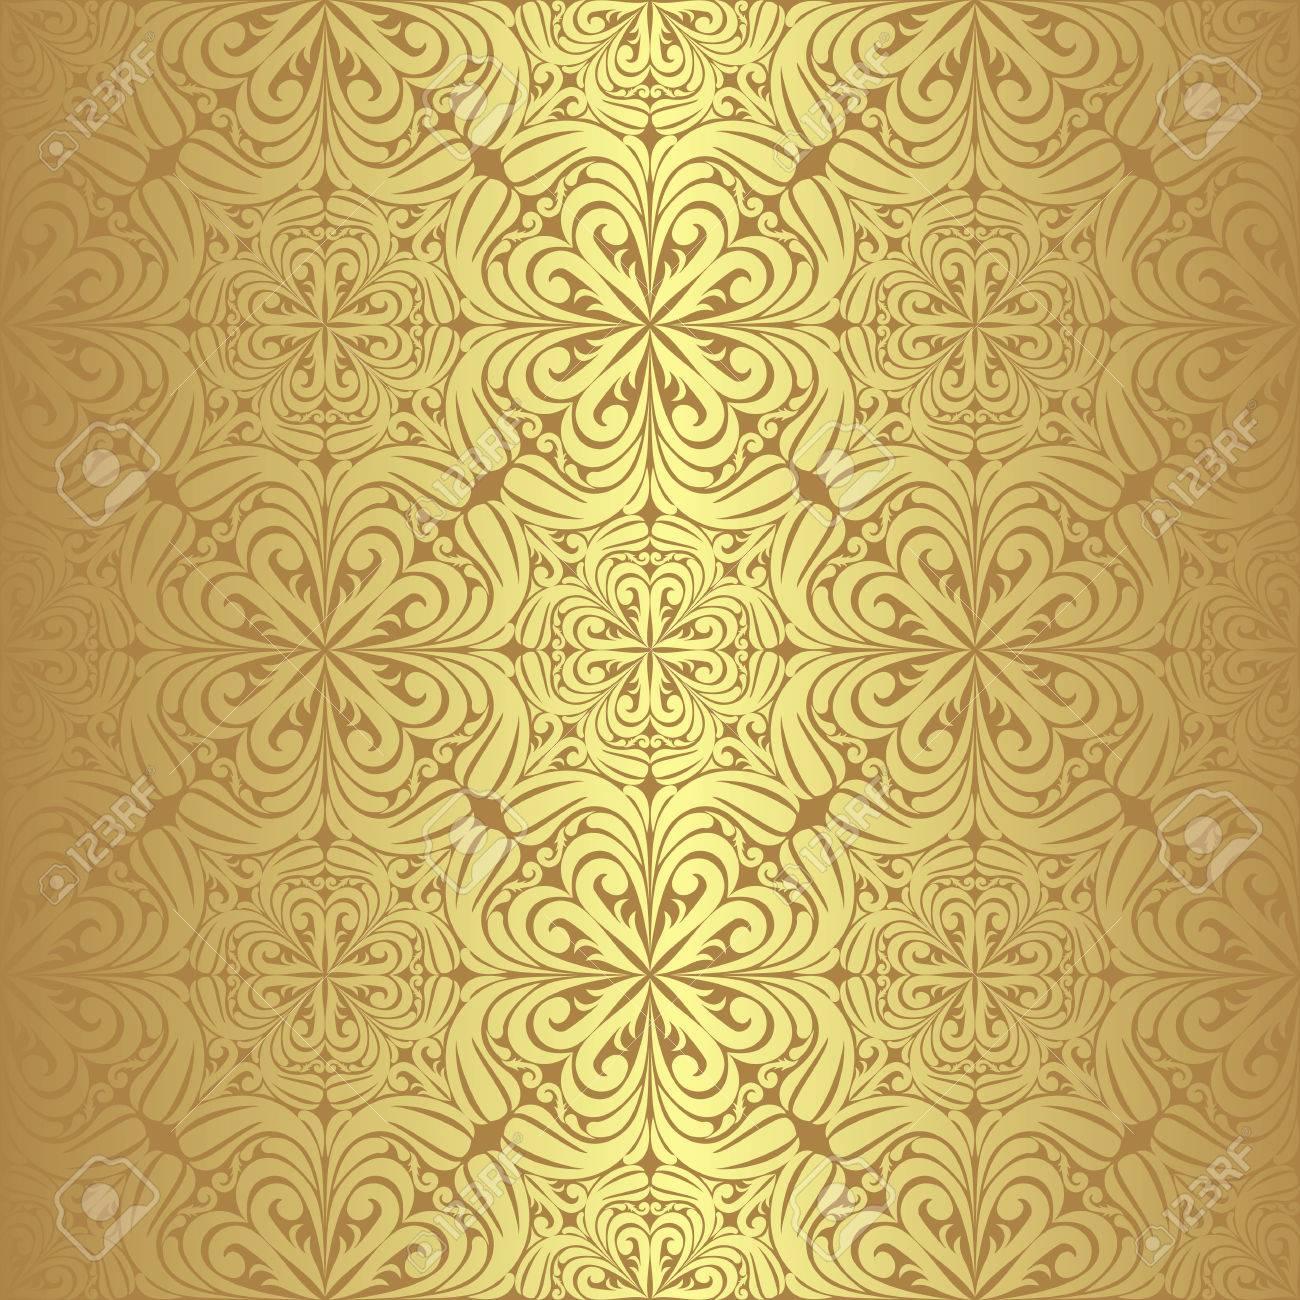 Luxury golden seamless Wallpaper - 24060622